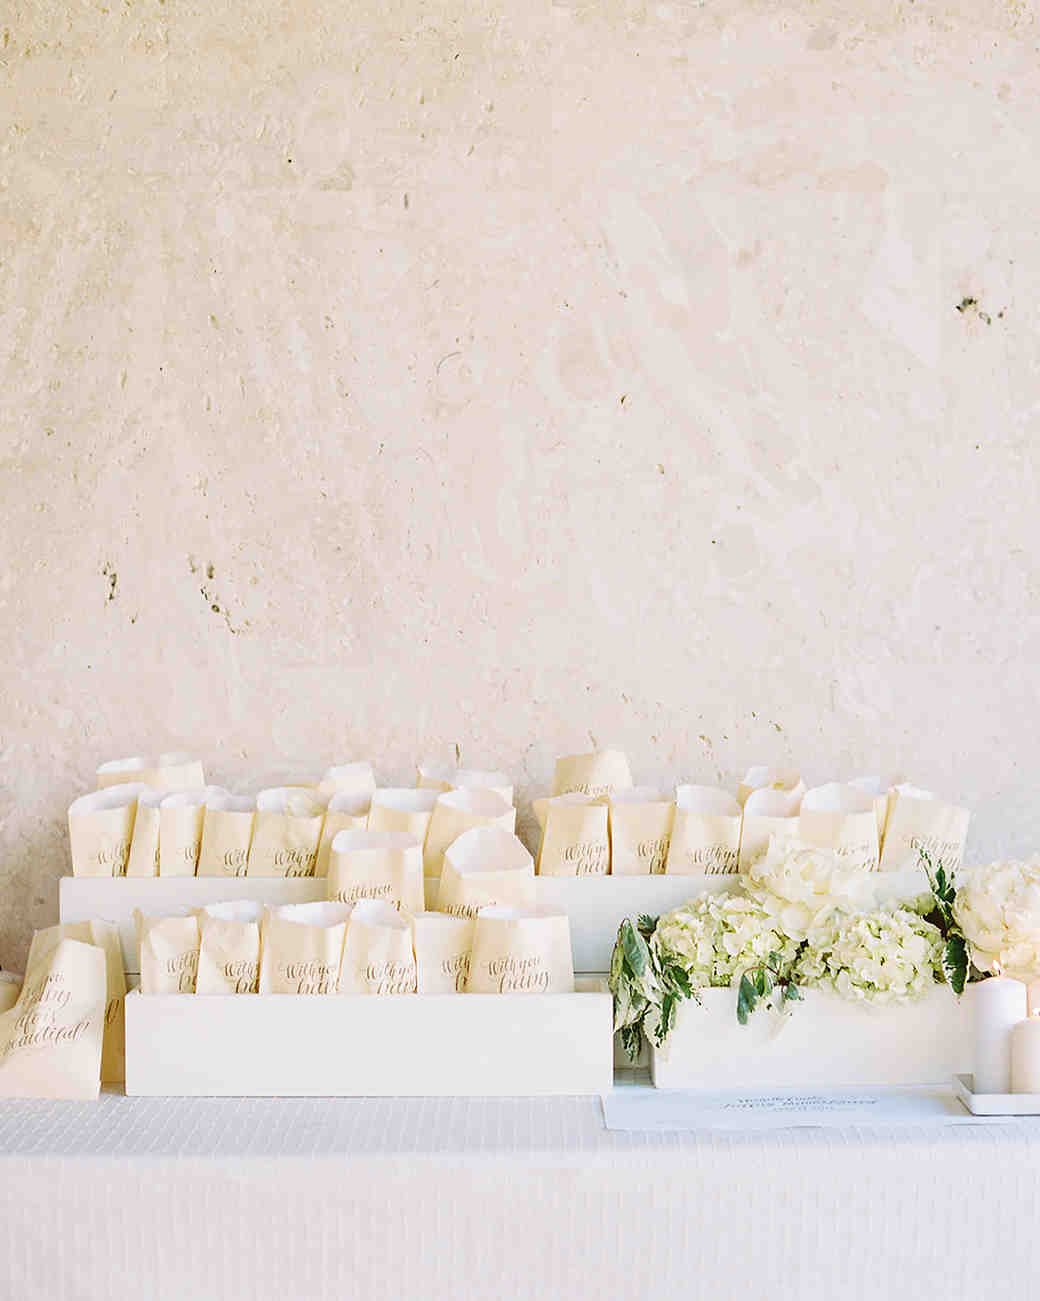 Wedding Flower Petal Bar, White Bags of Petals